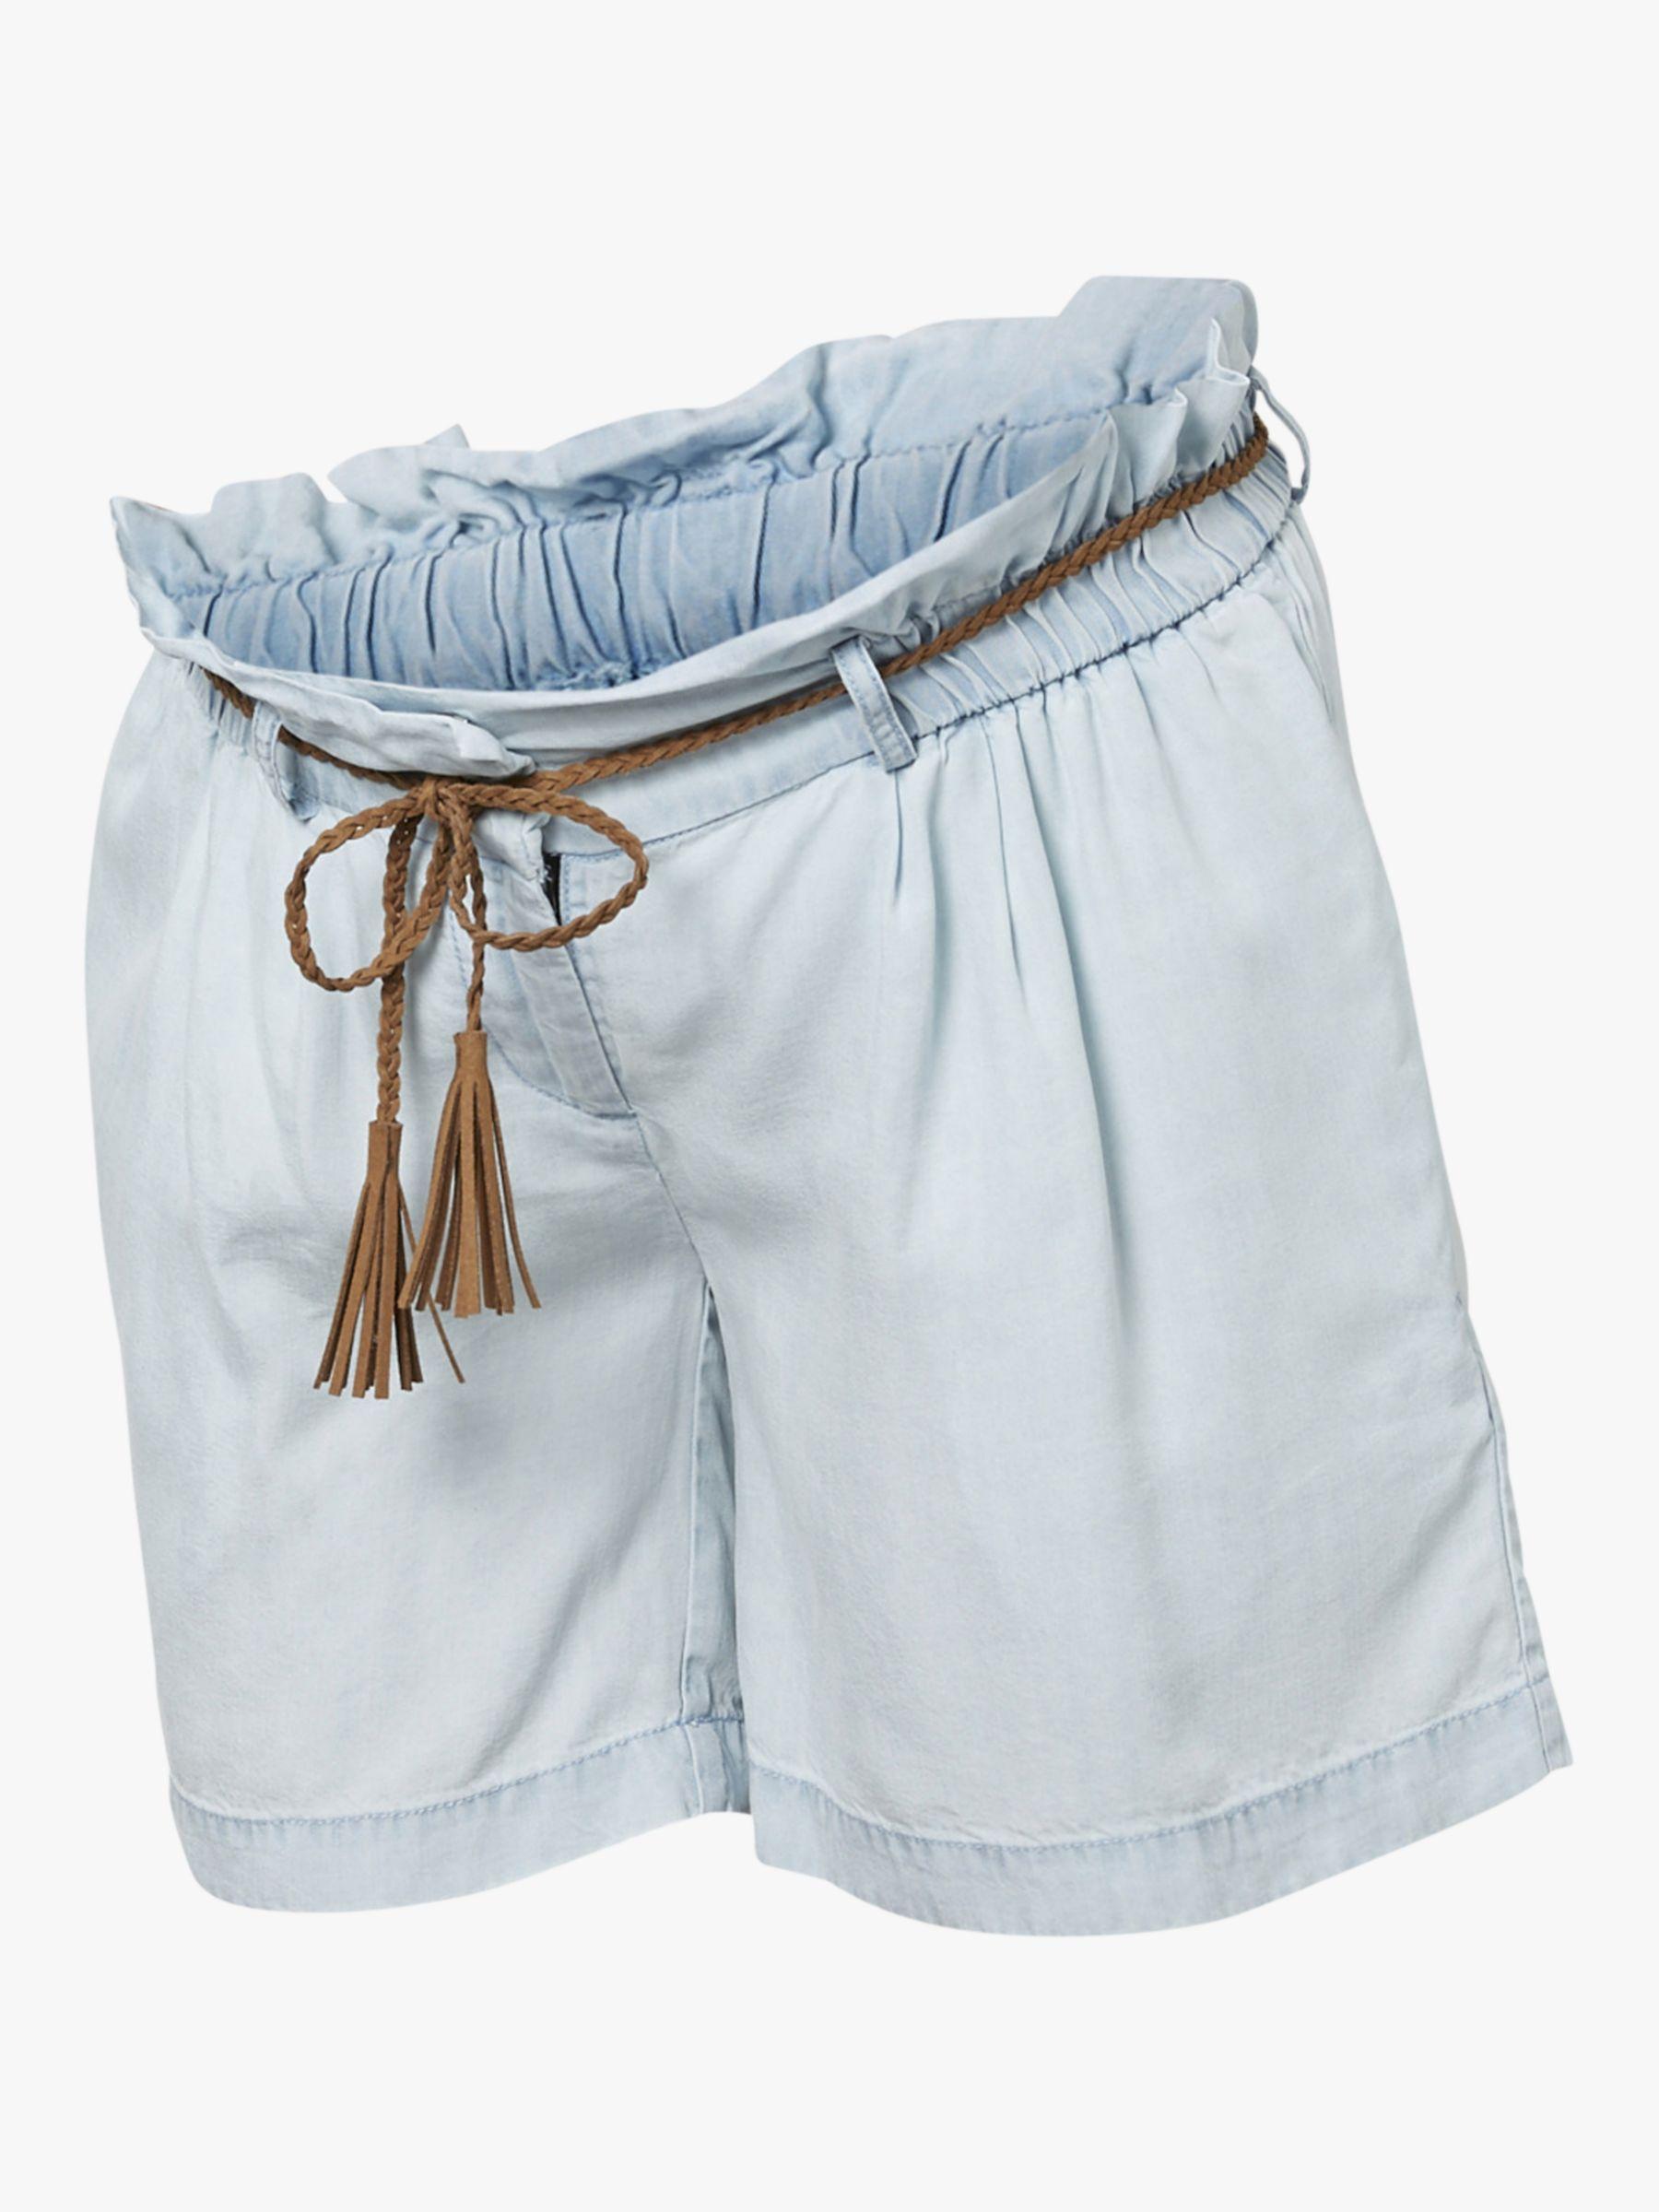 486971eca536 Mamalicious Mladora Tie Waist Maternity Shorts, Light Blue Denim